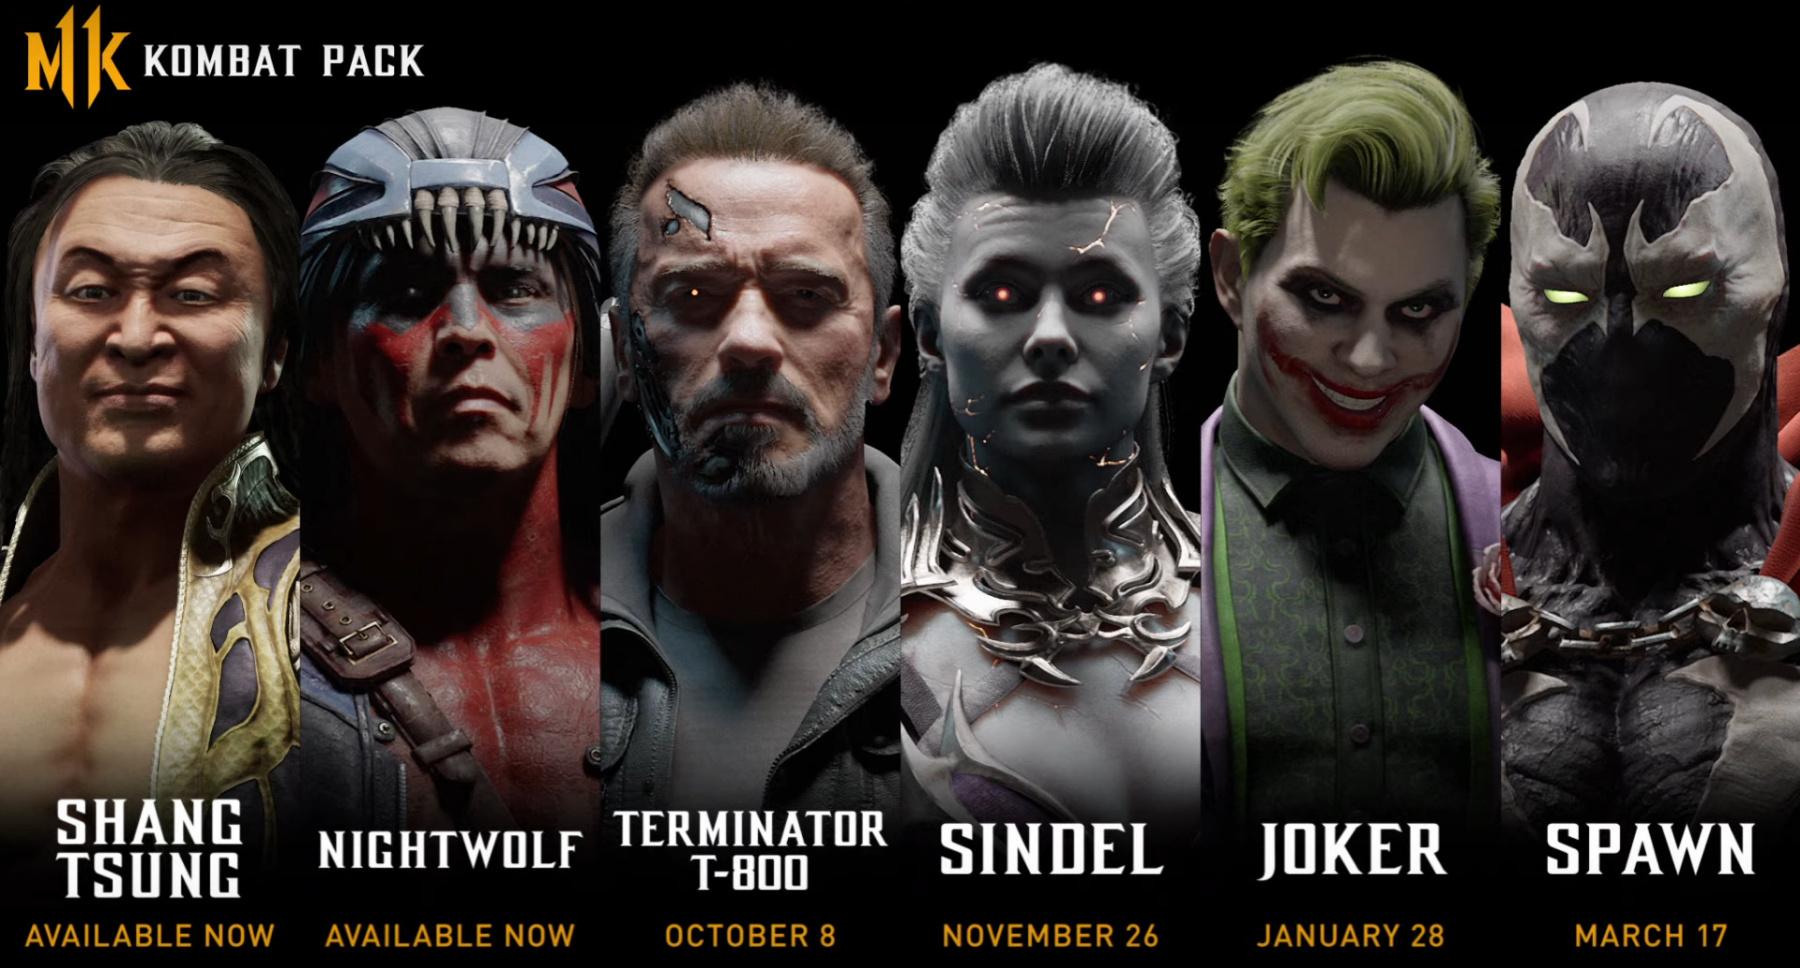 Mortal Kombat 11 DLC Characters Confirmed, Pack Includes ...